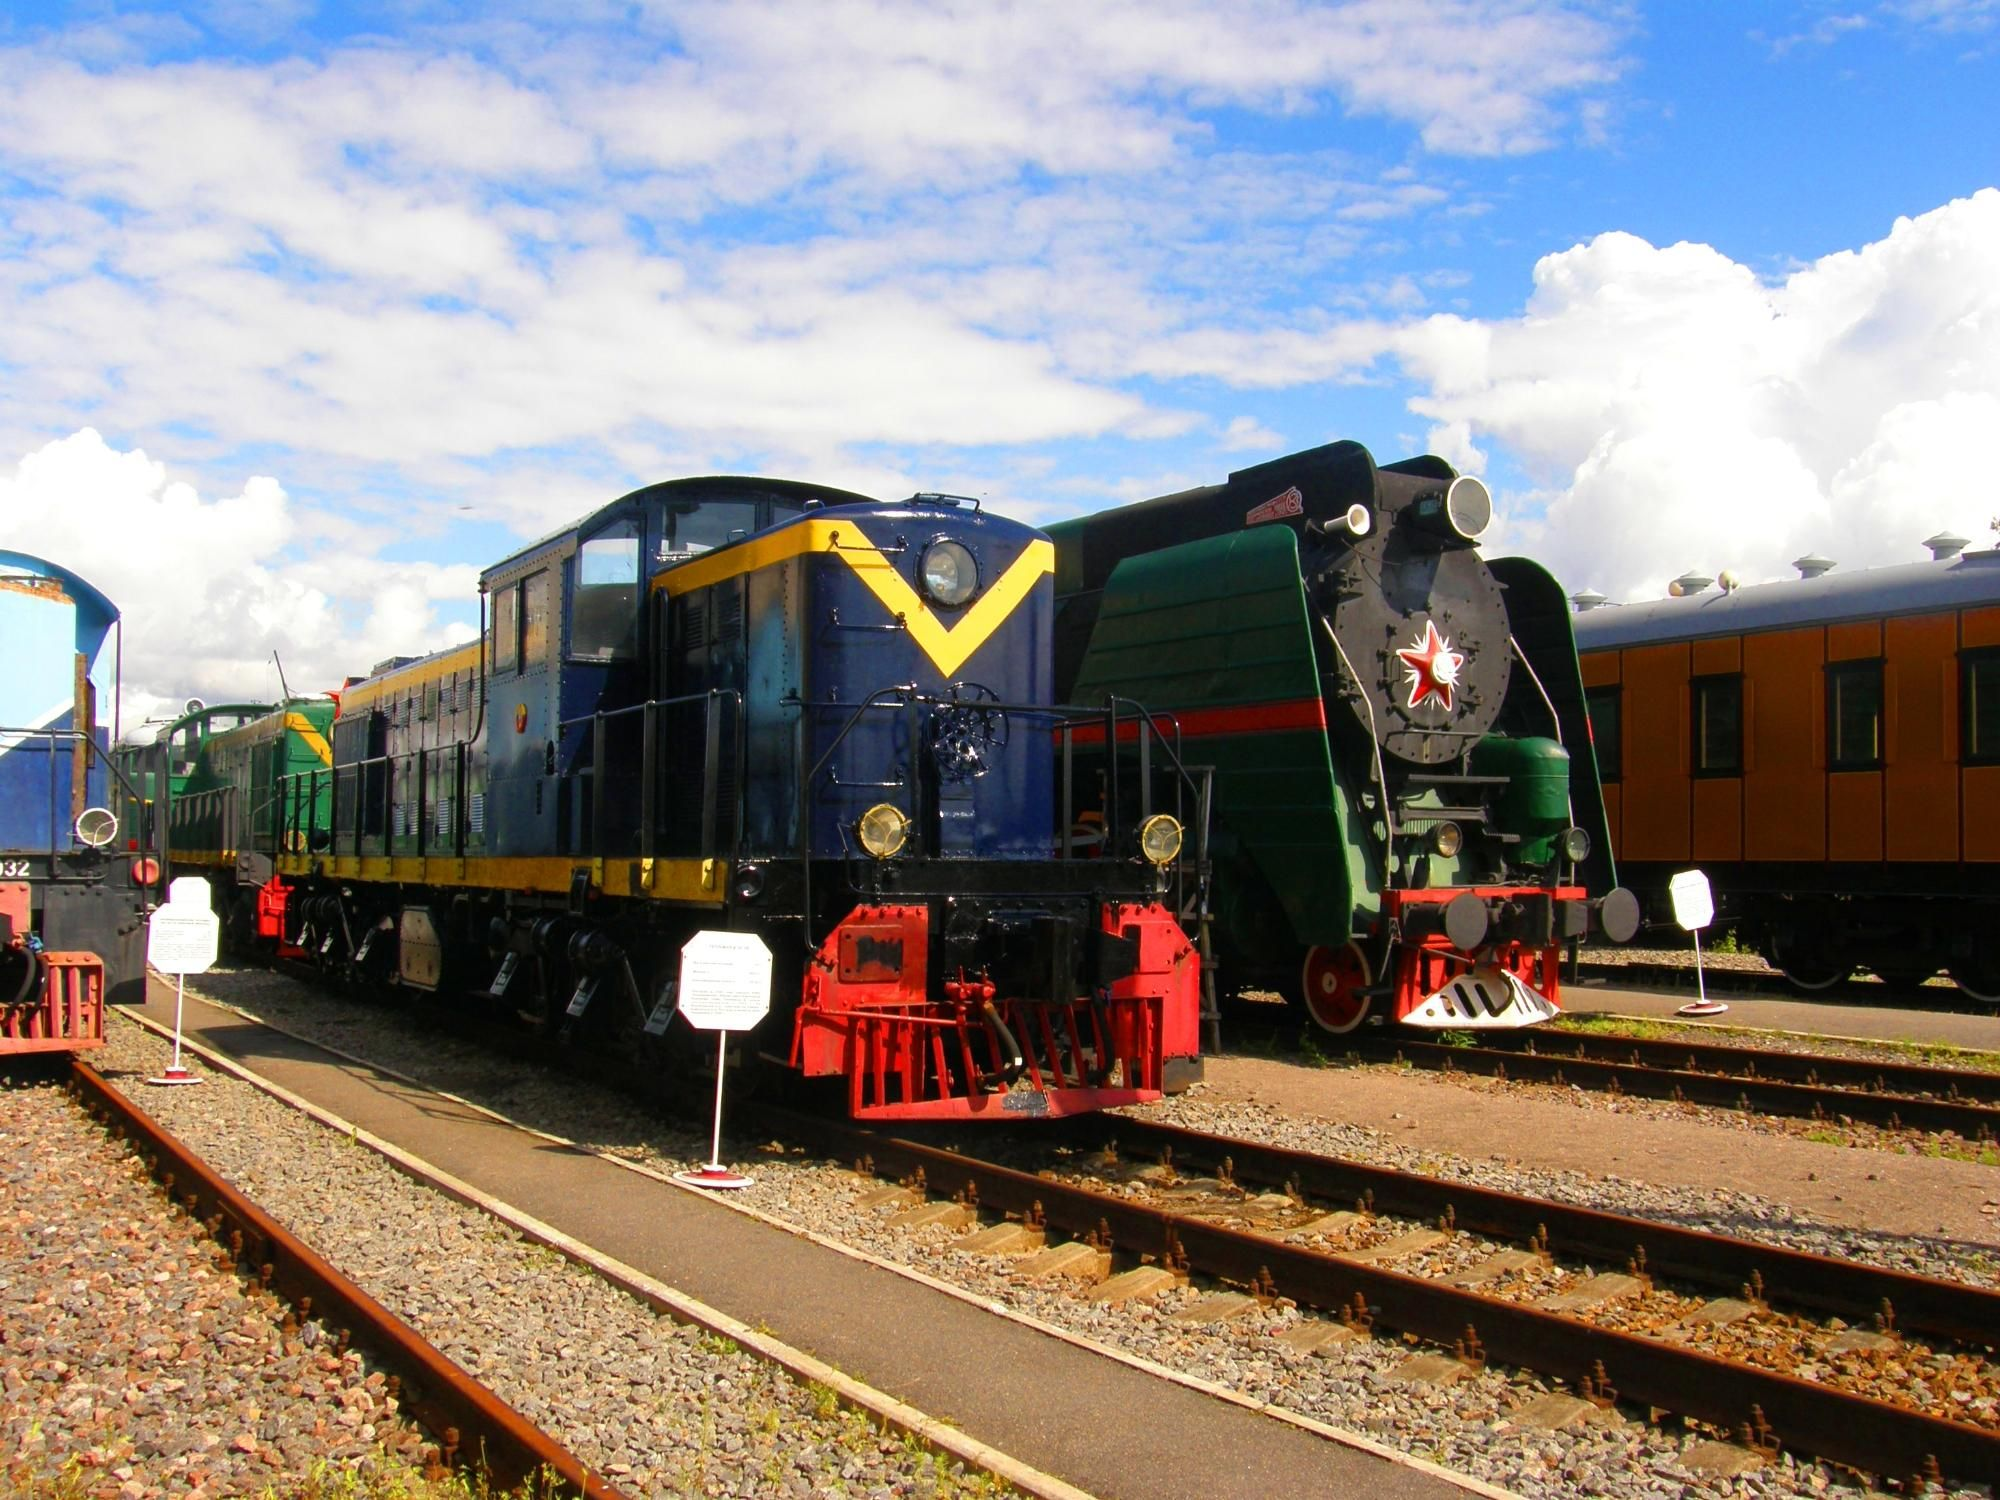 Museum of Railway Equipment - St. Petersburg, Russia